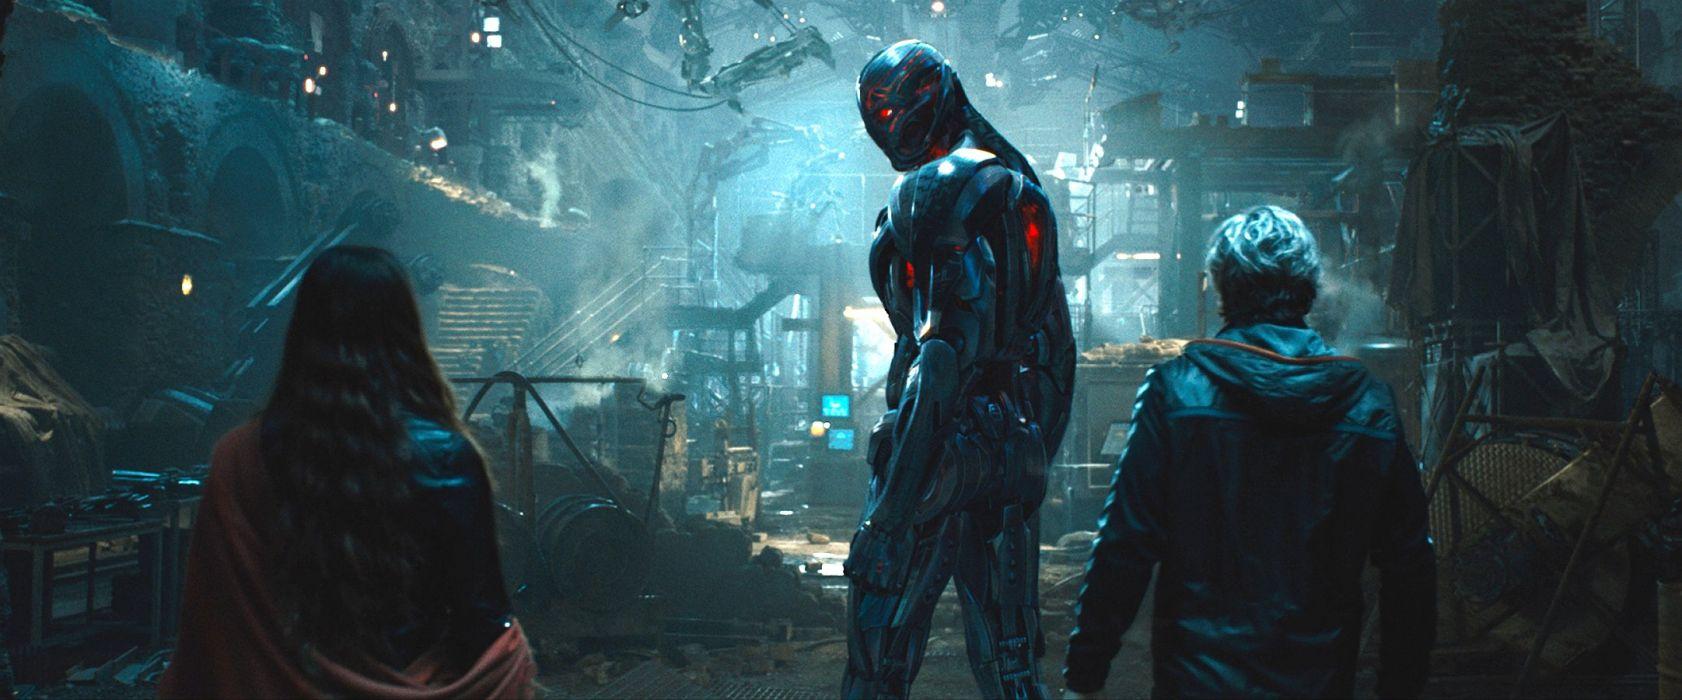 AVENGERS AGE ULTRON marvel comics superhero ageultron action adventure fighting warrior robot wallpaper